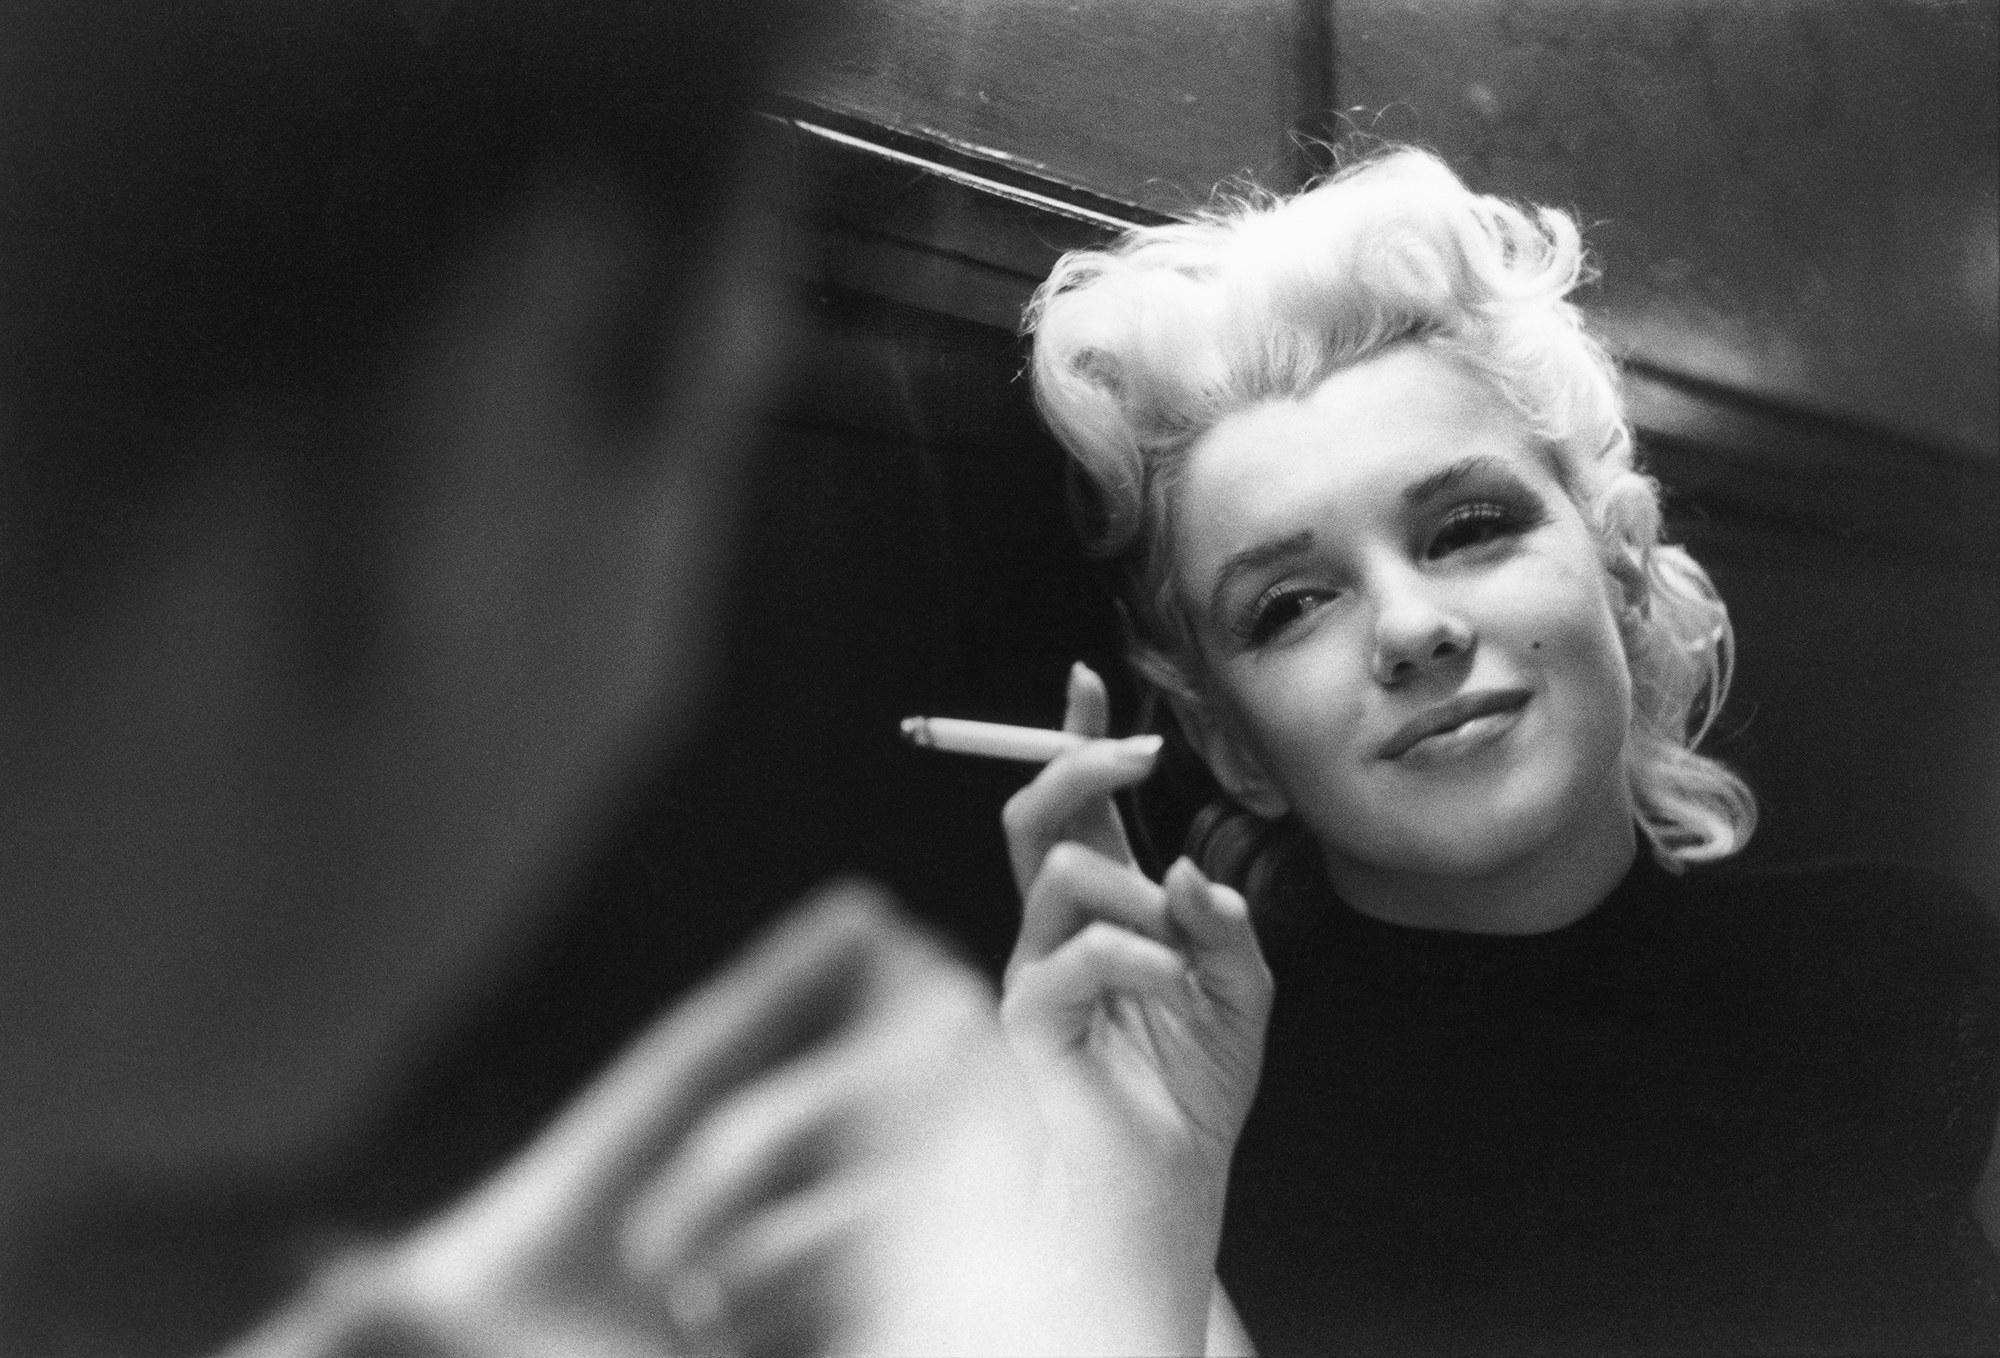 Marilyn Monroe smoking a cigarette